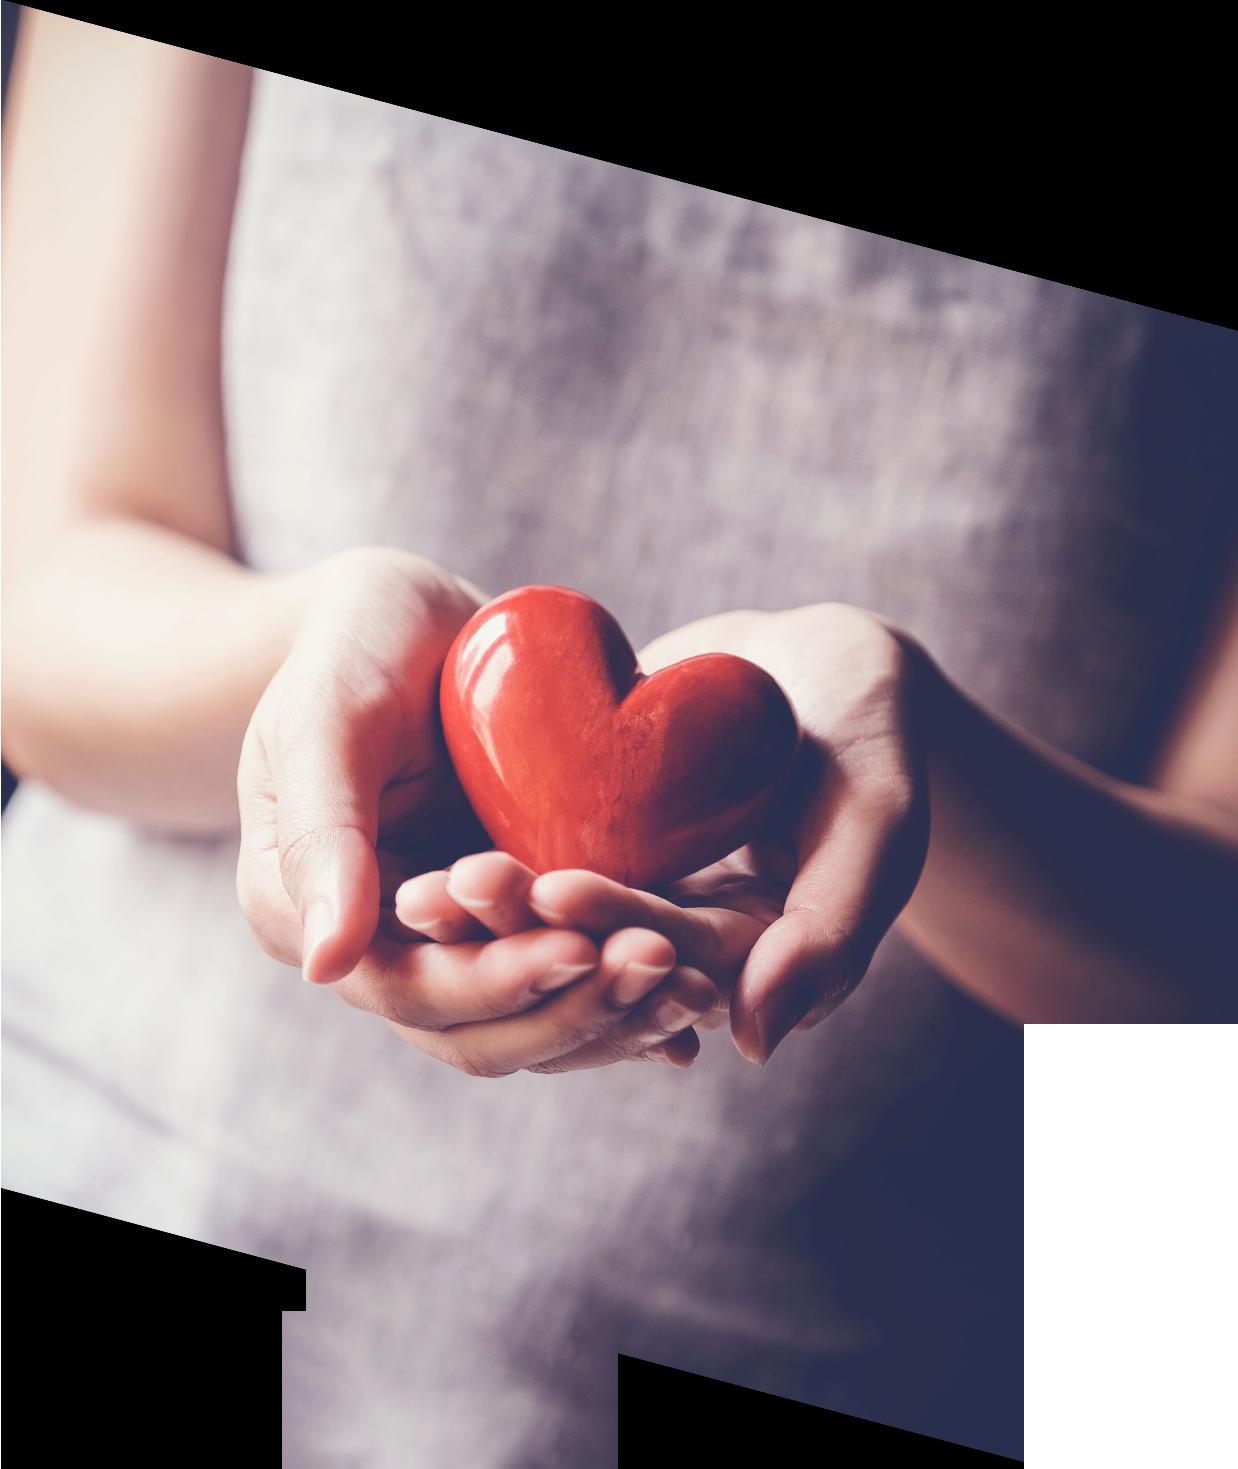 https://www.cervinfamilyoffice.com/wp-content/uploads/2021/06/philanthropy-Social-Impact-SEVICE-L-1.png